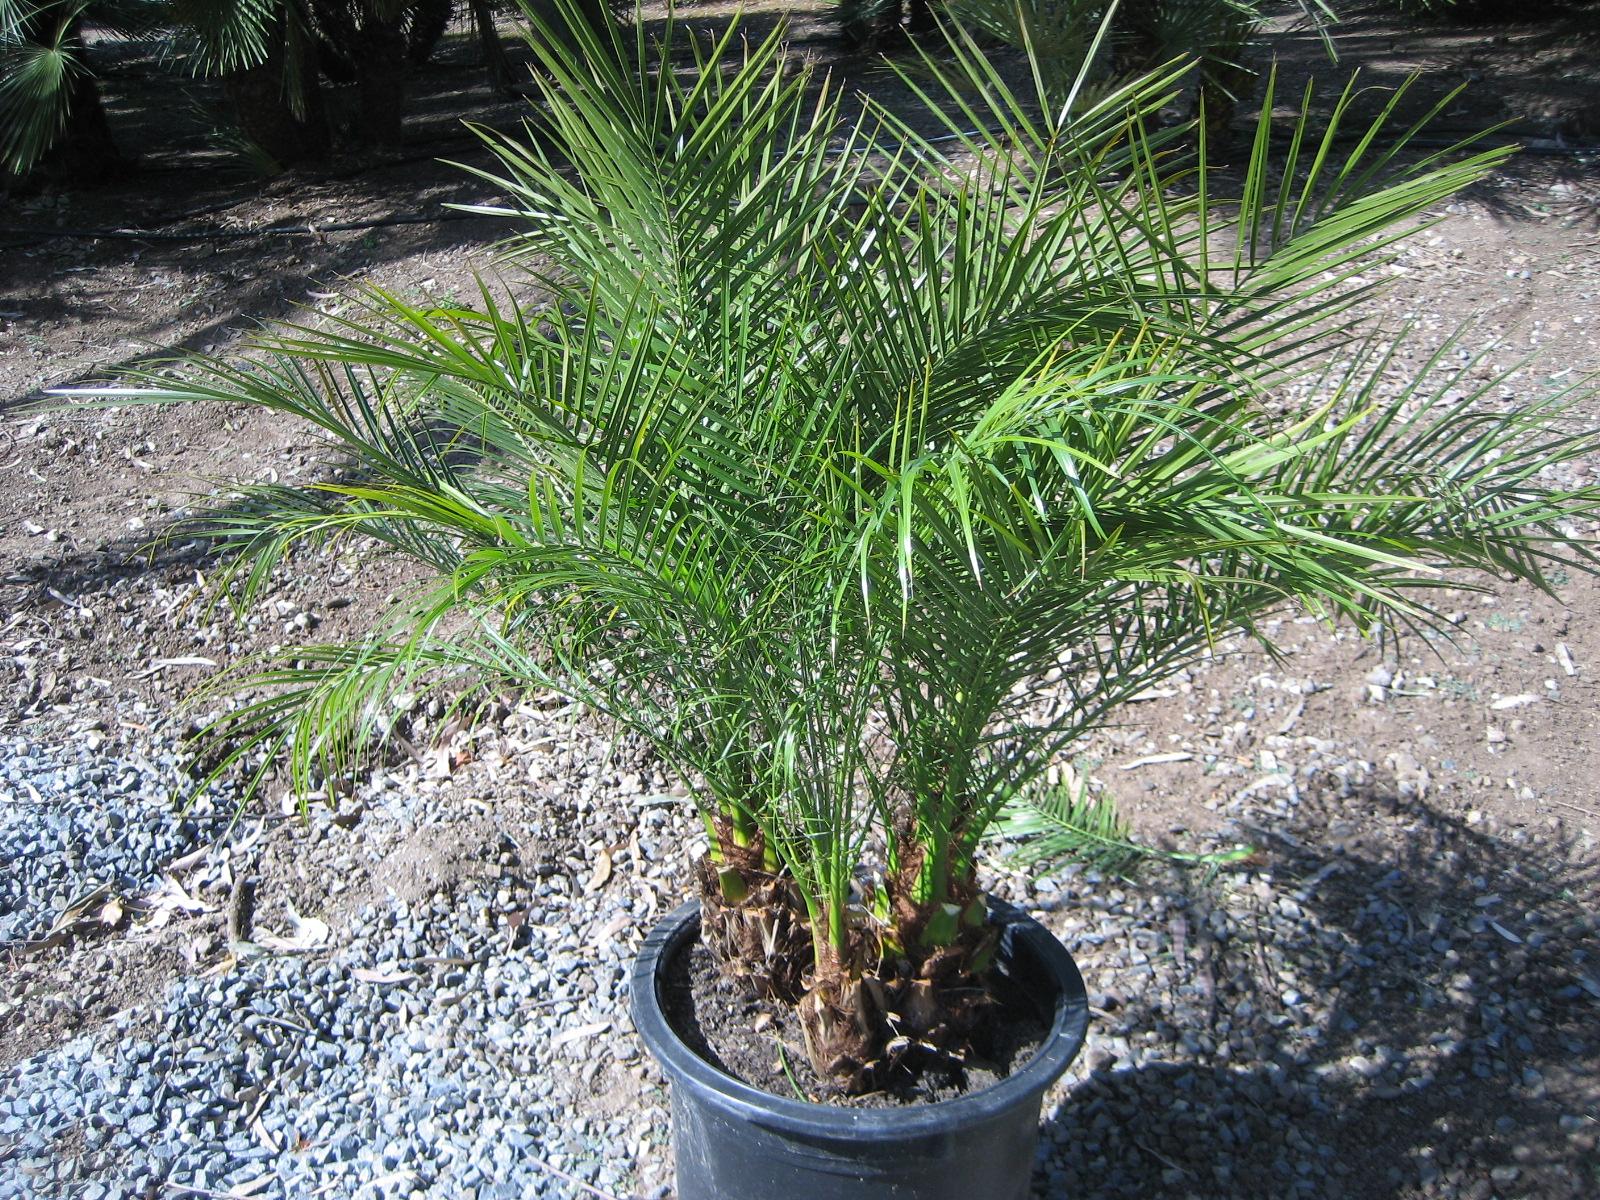 Pygmy date palm in Australia